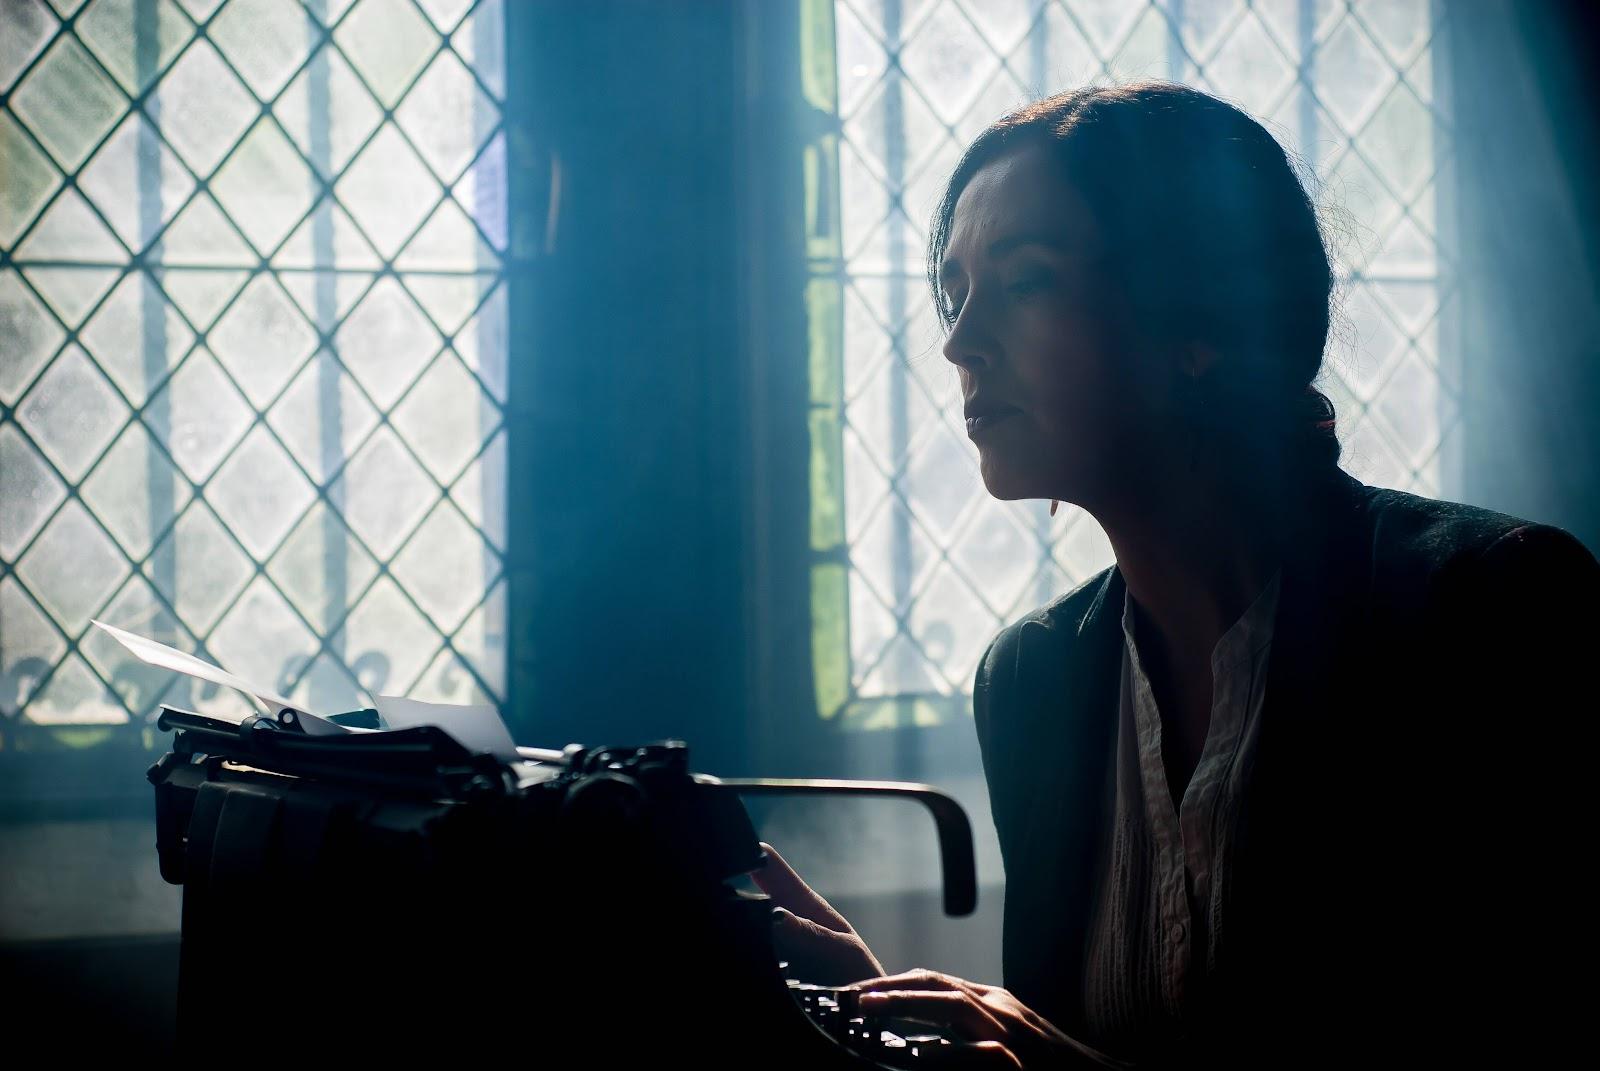 Girl writing dramatically on a type writer